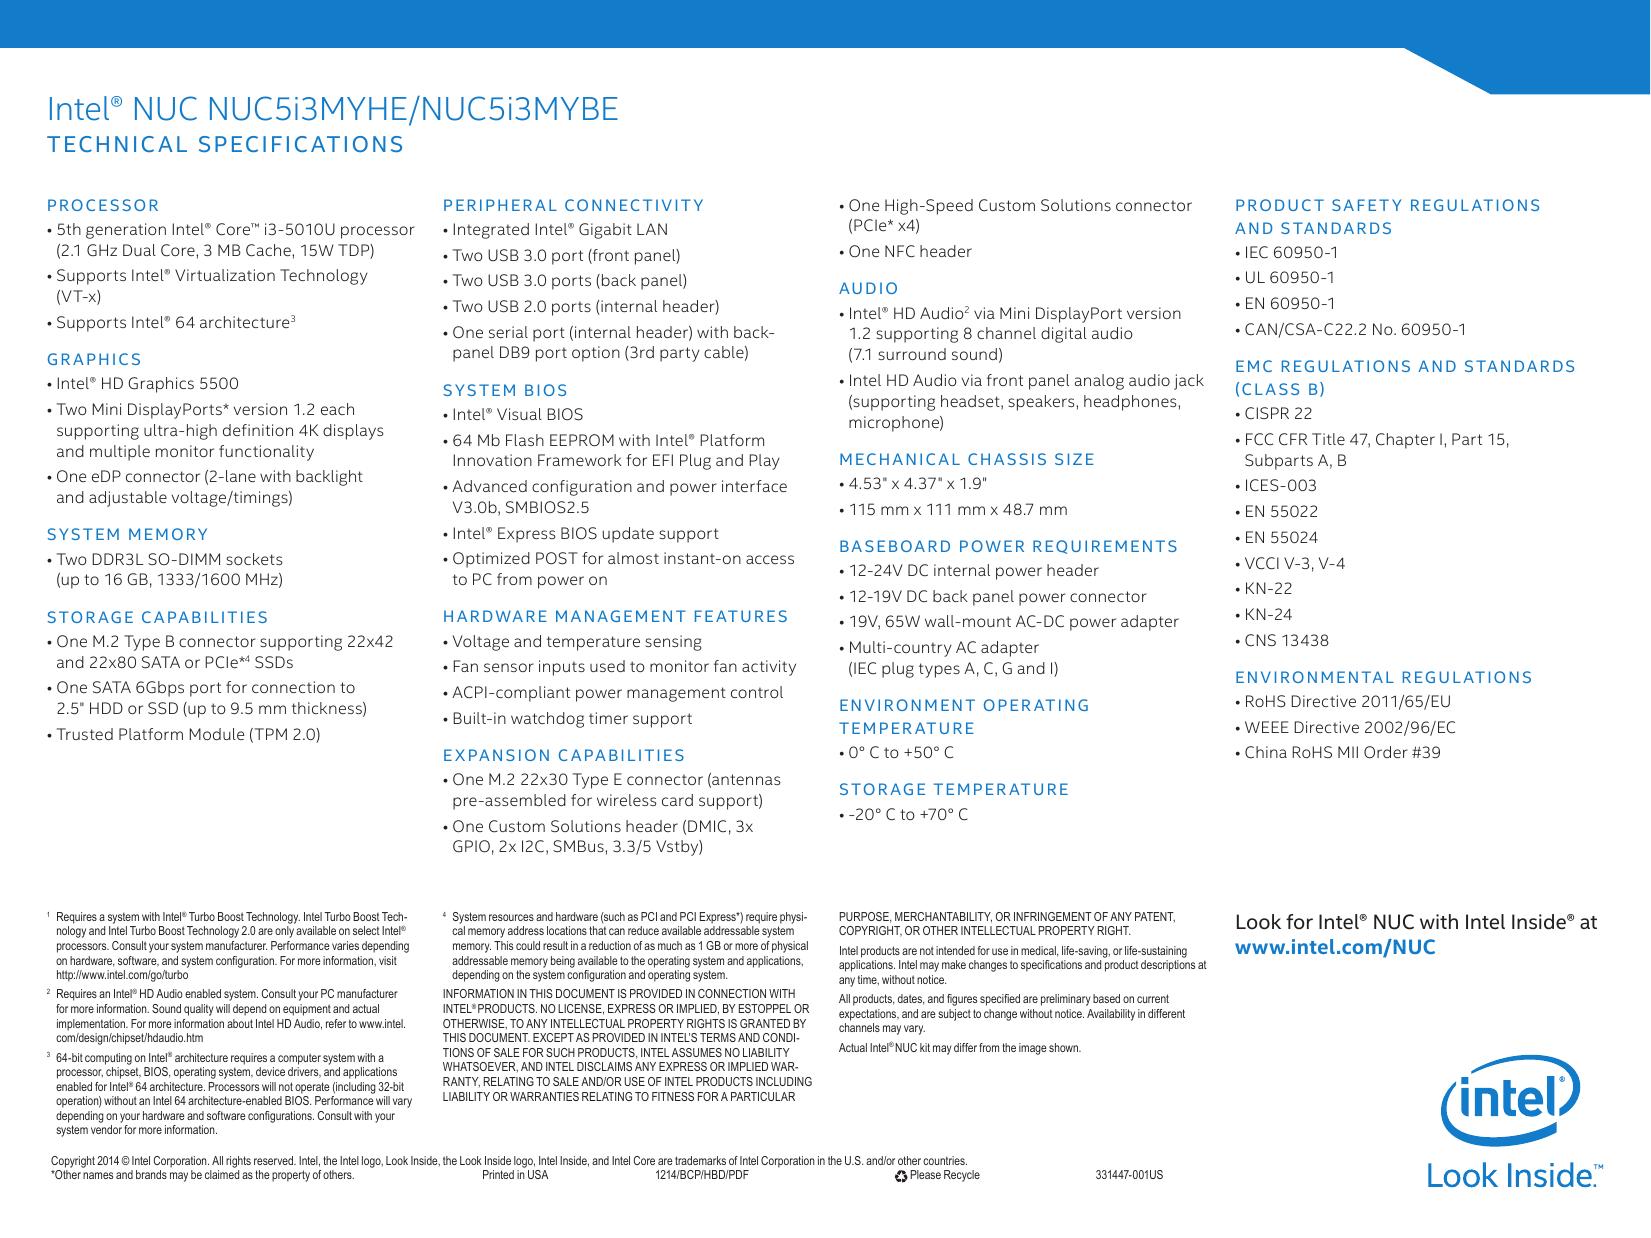 Intel® NUC Kit NUC5i3MYHE and Intel® NUC Board | manualzz com